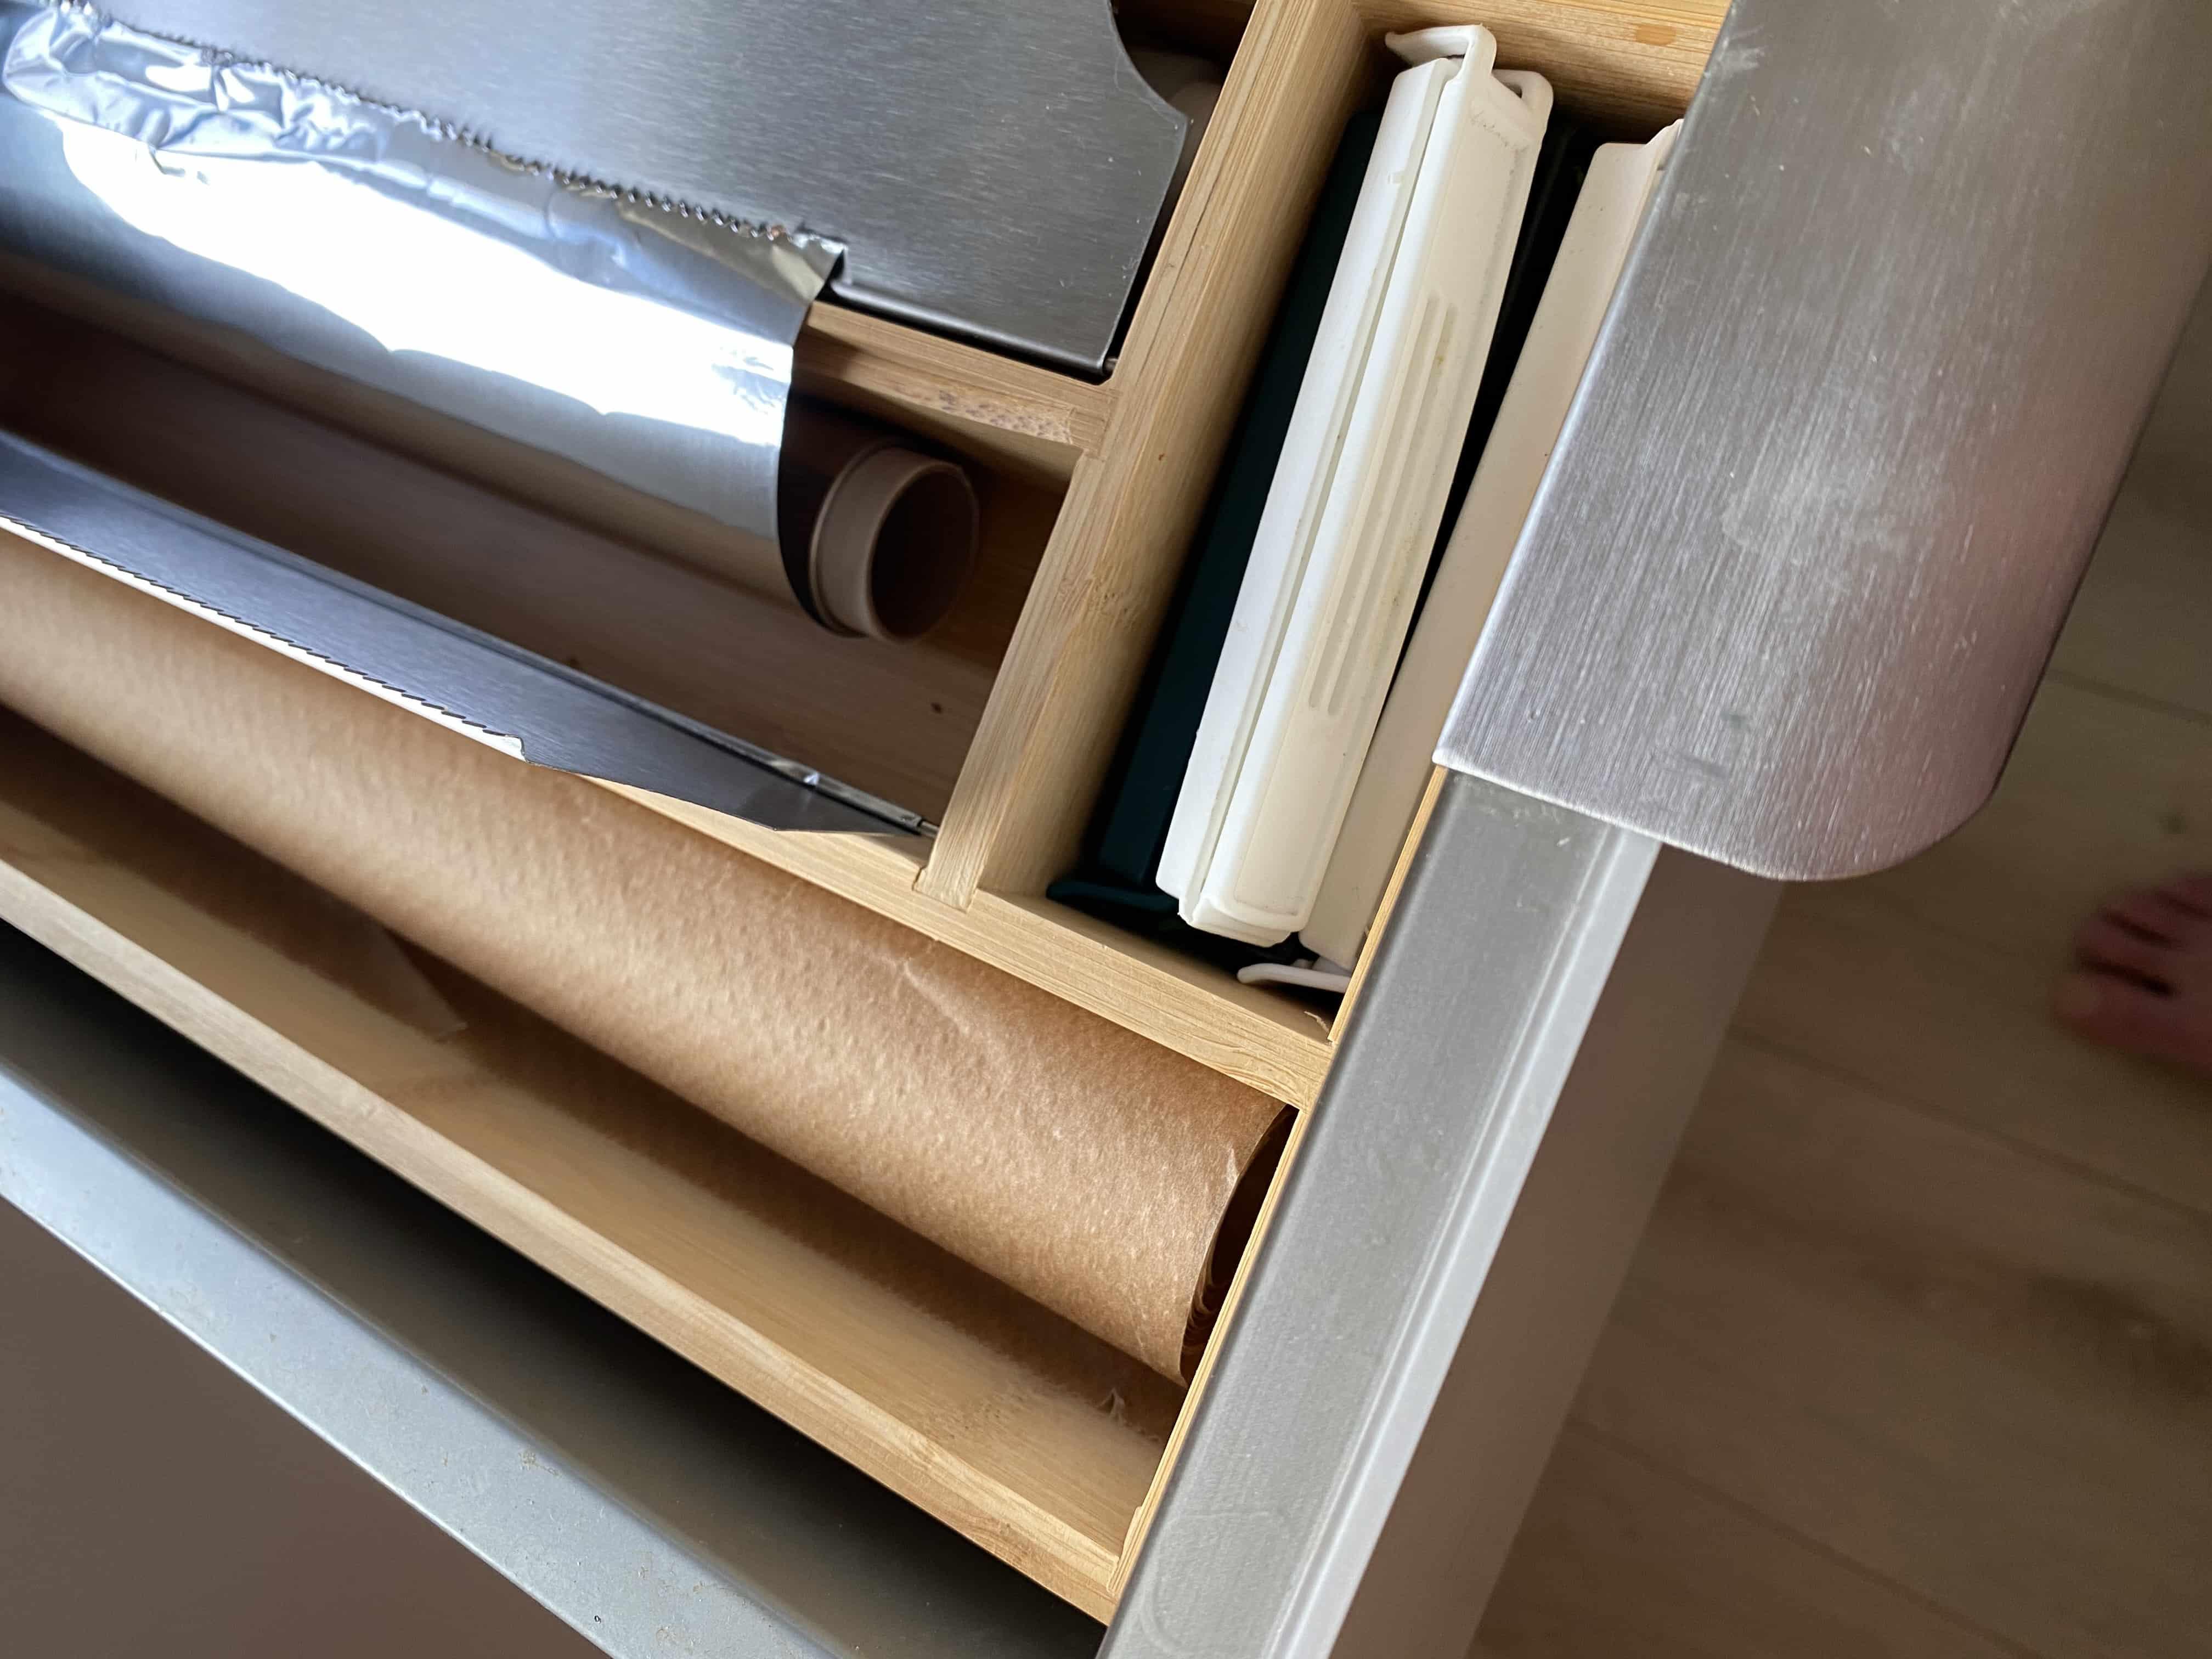 4goodz Bamboe keukenrolhouder met RVS afscheurplaten - 42x19x5,4 cm